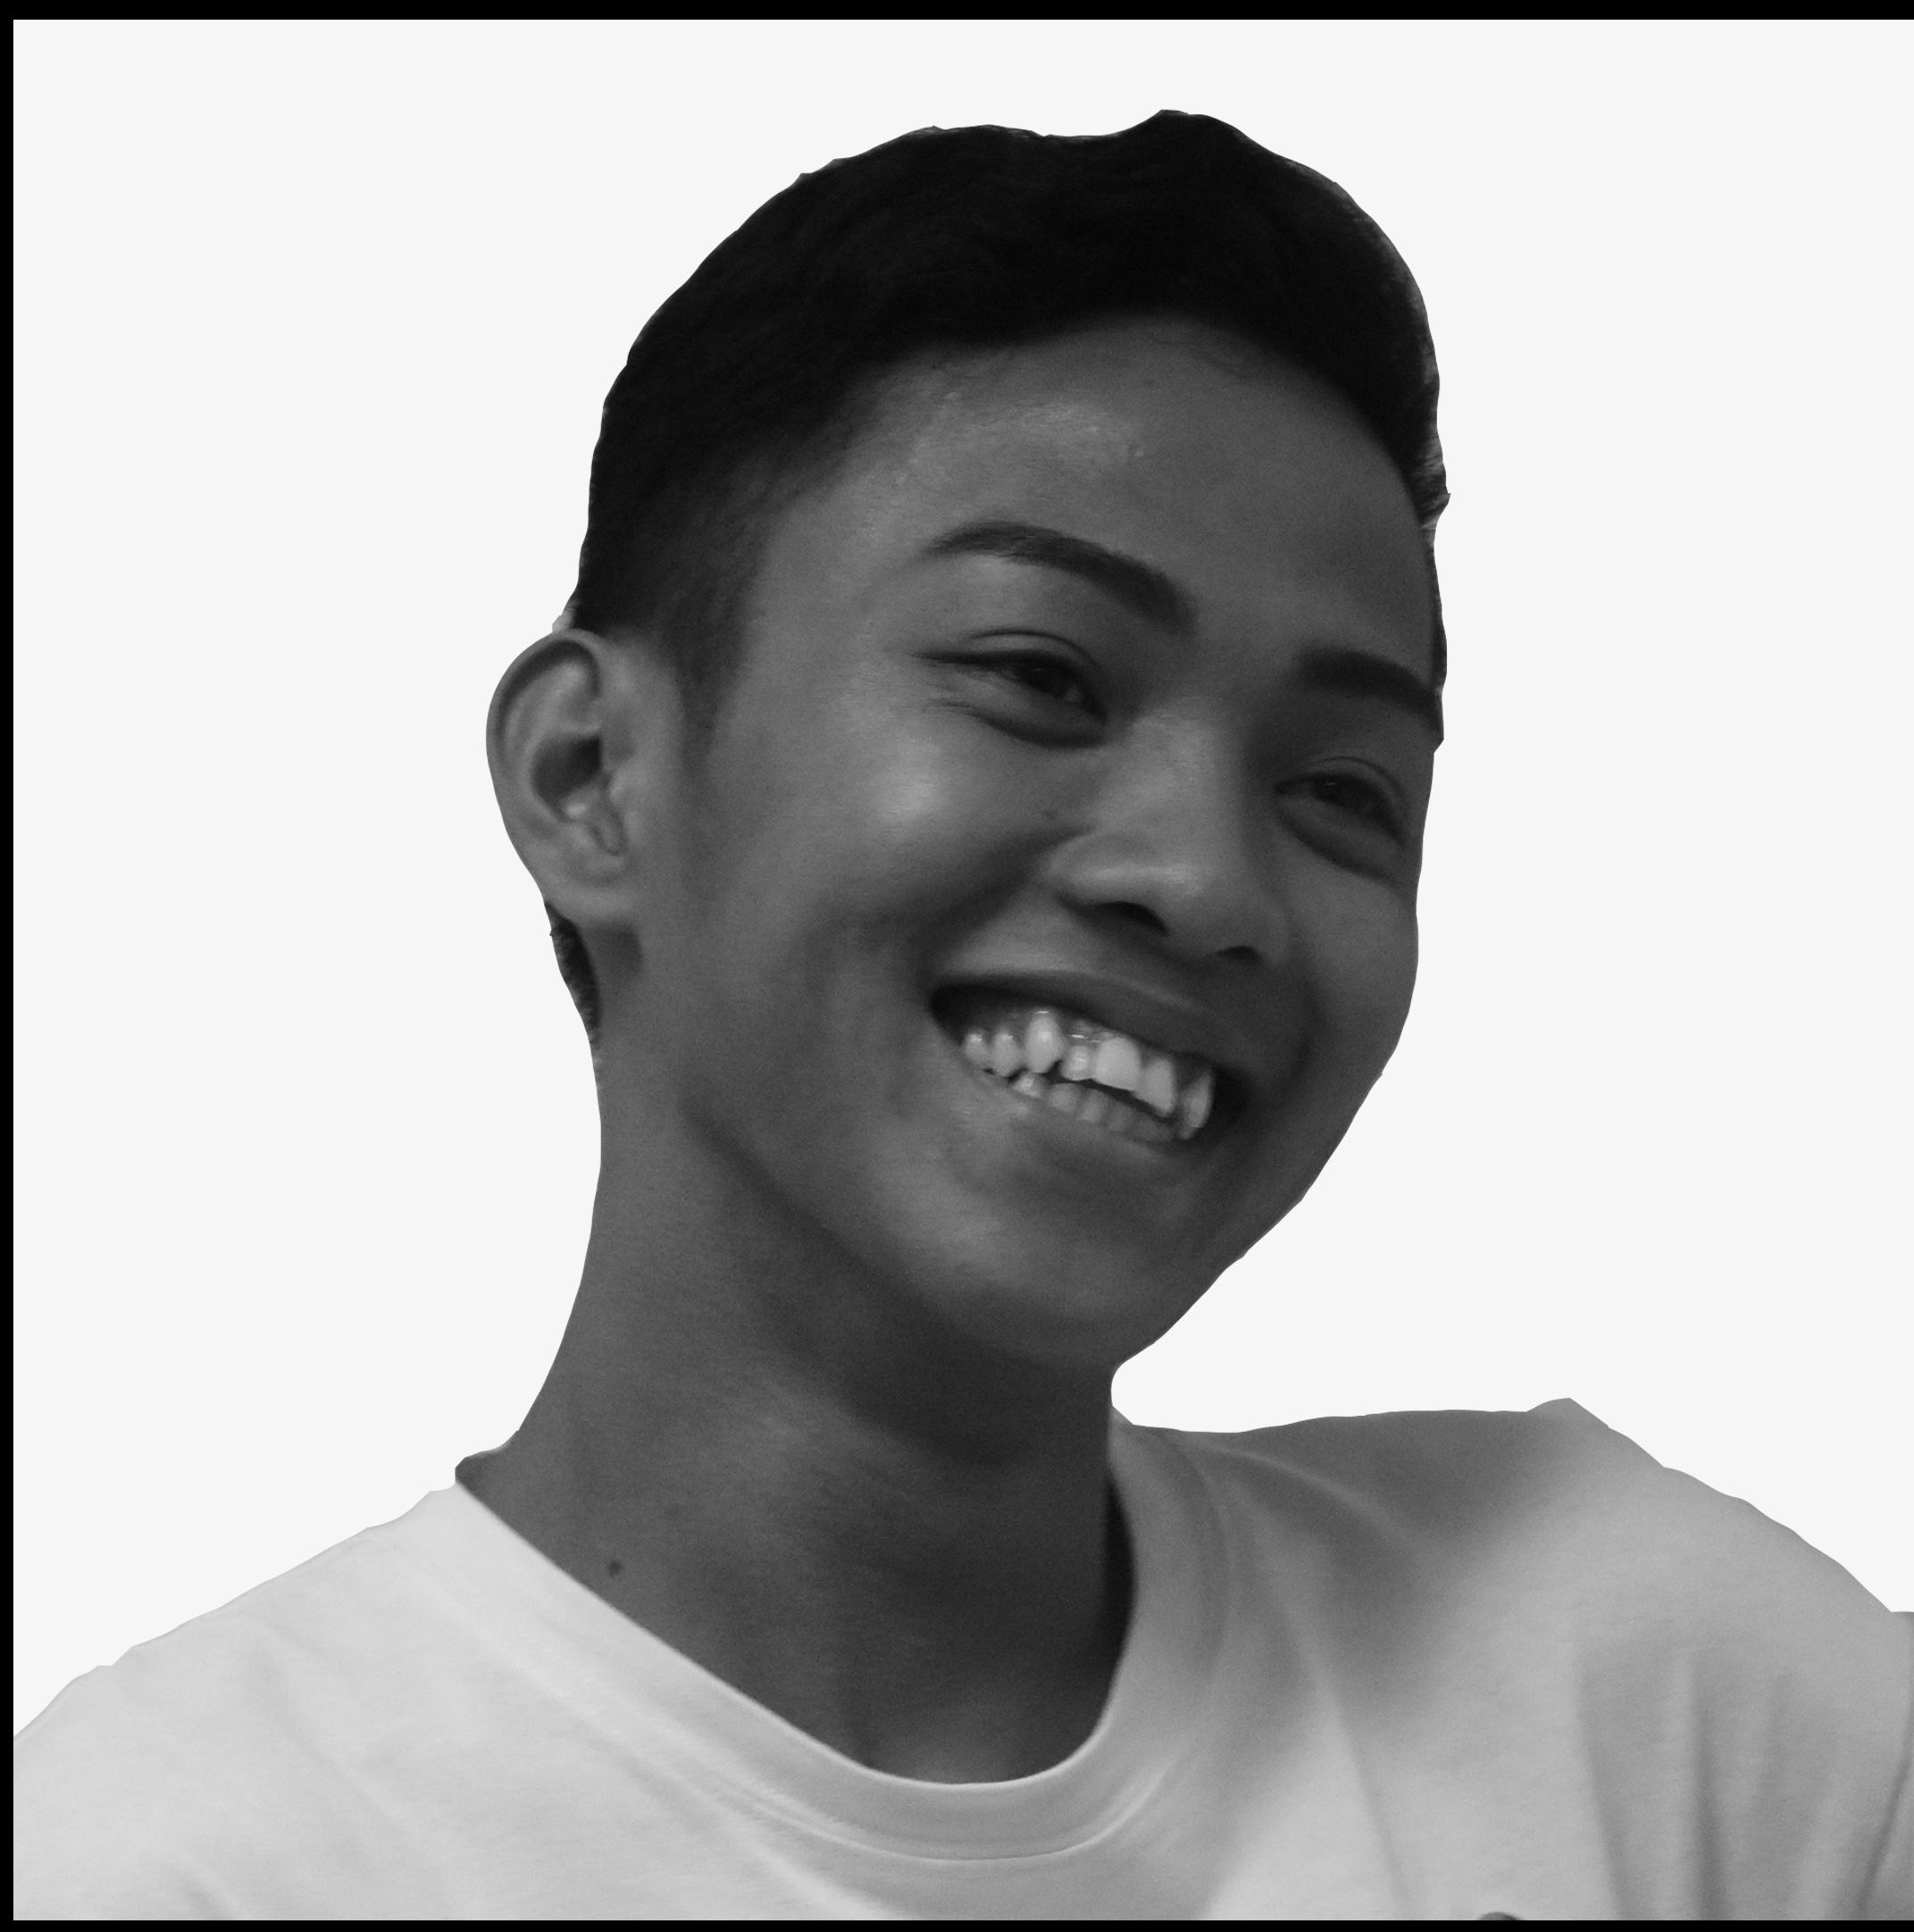 Jeam_Profile - Circle Edited.png